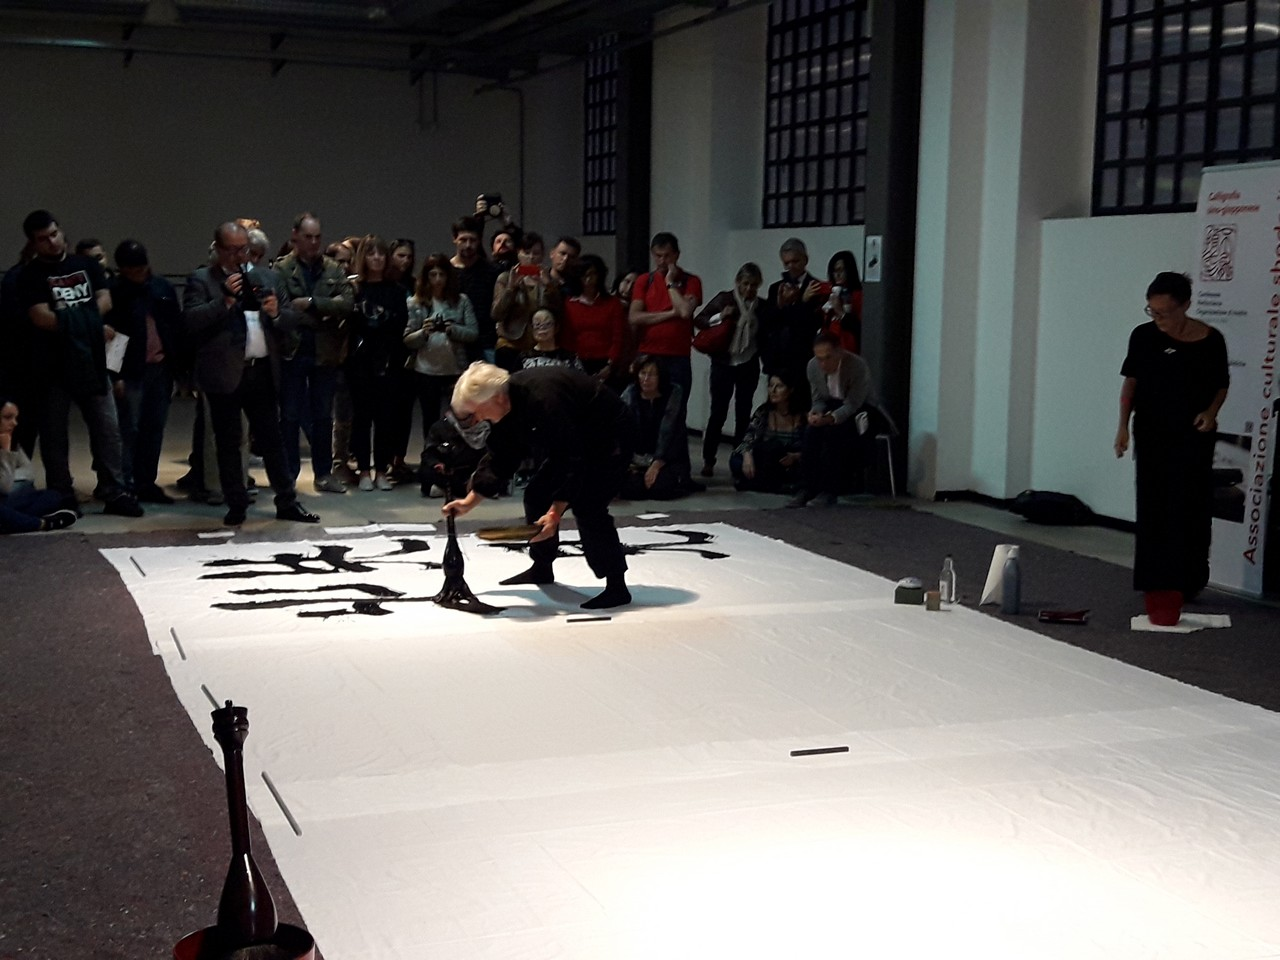 JapanFestival-Milano2018-fotoPagineZeni_016